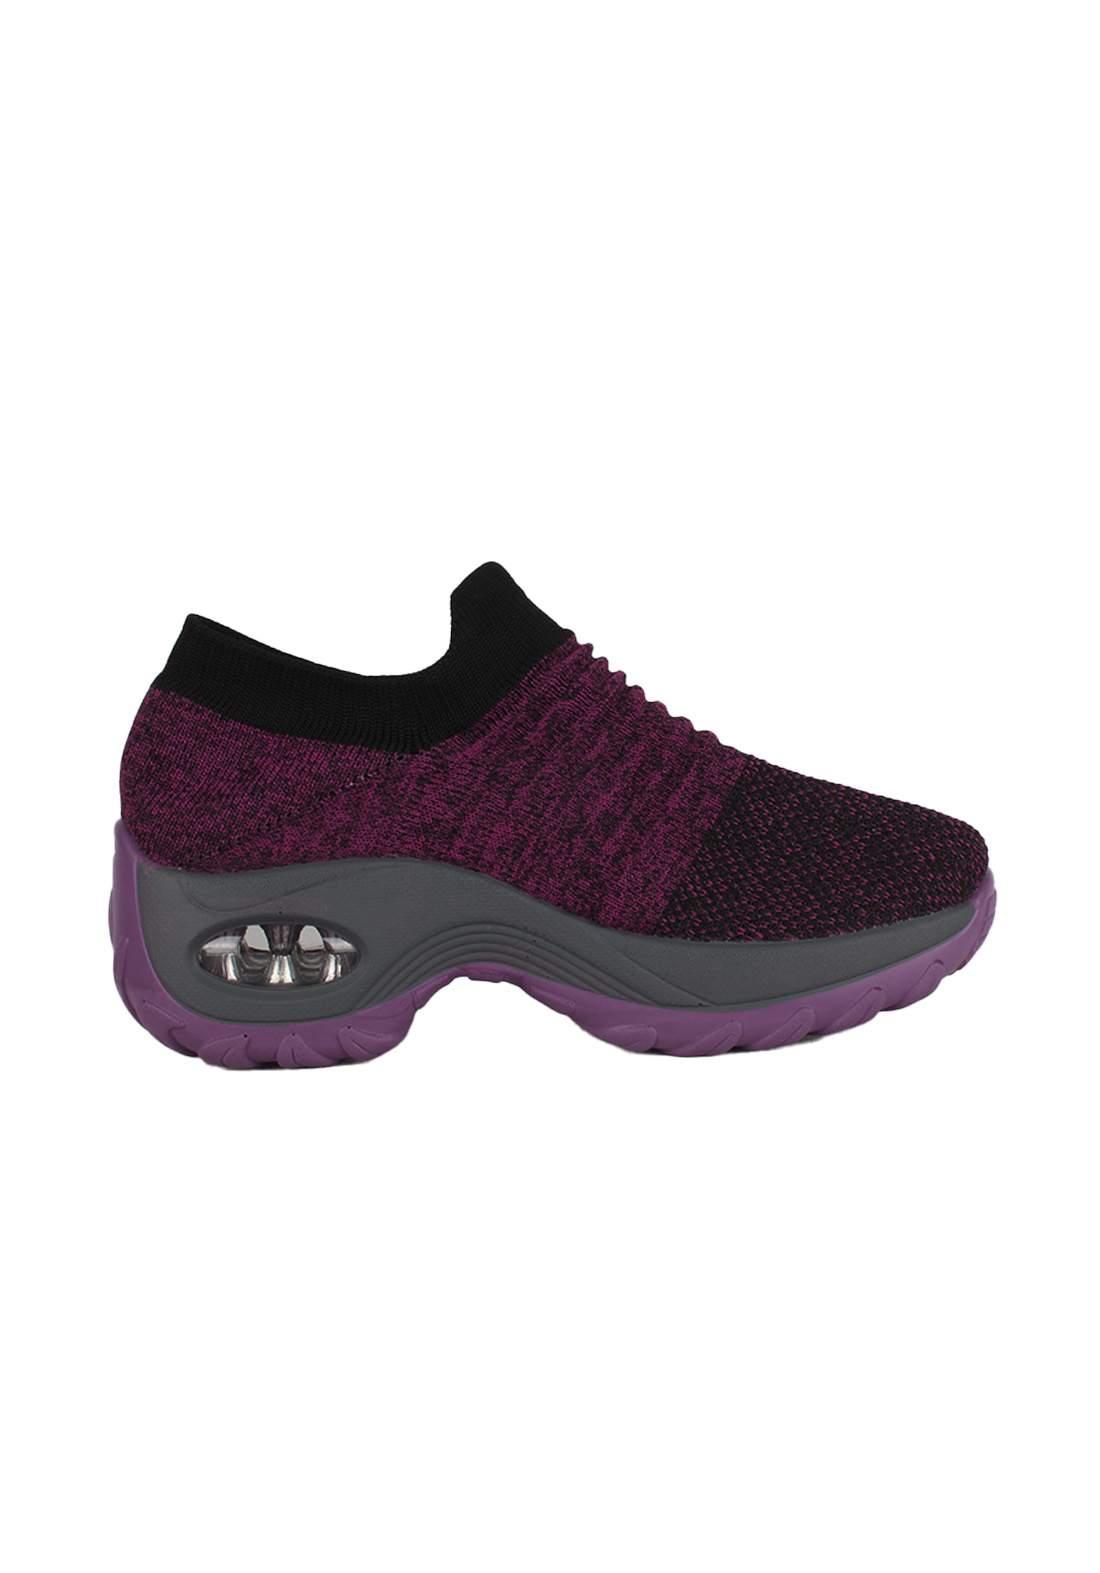 حذاء نسائي رياضي بنفسجي اللون